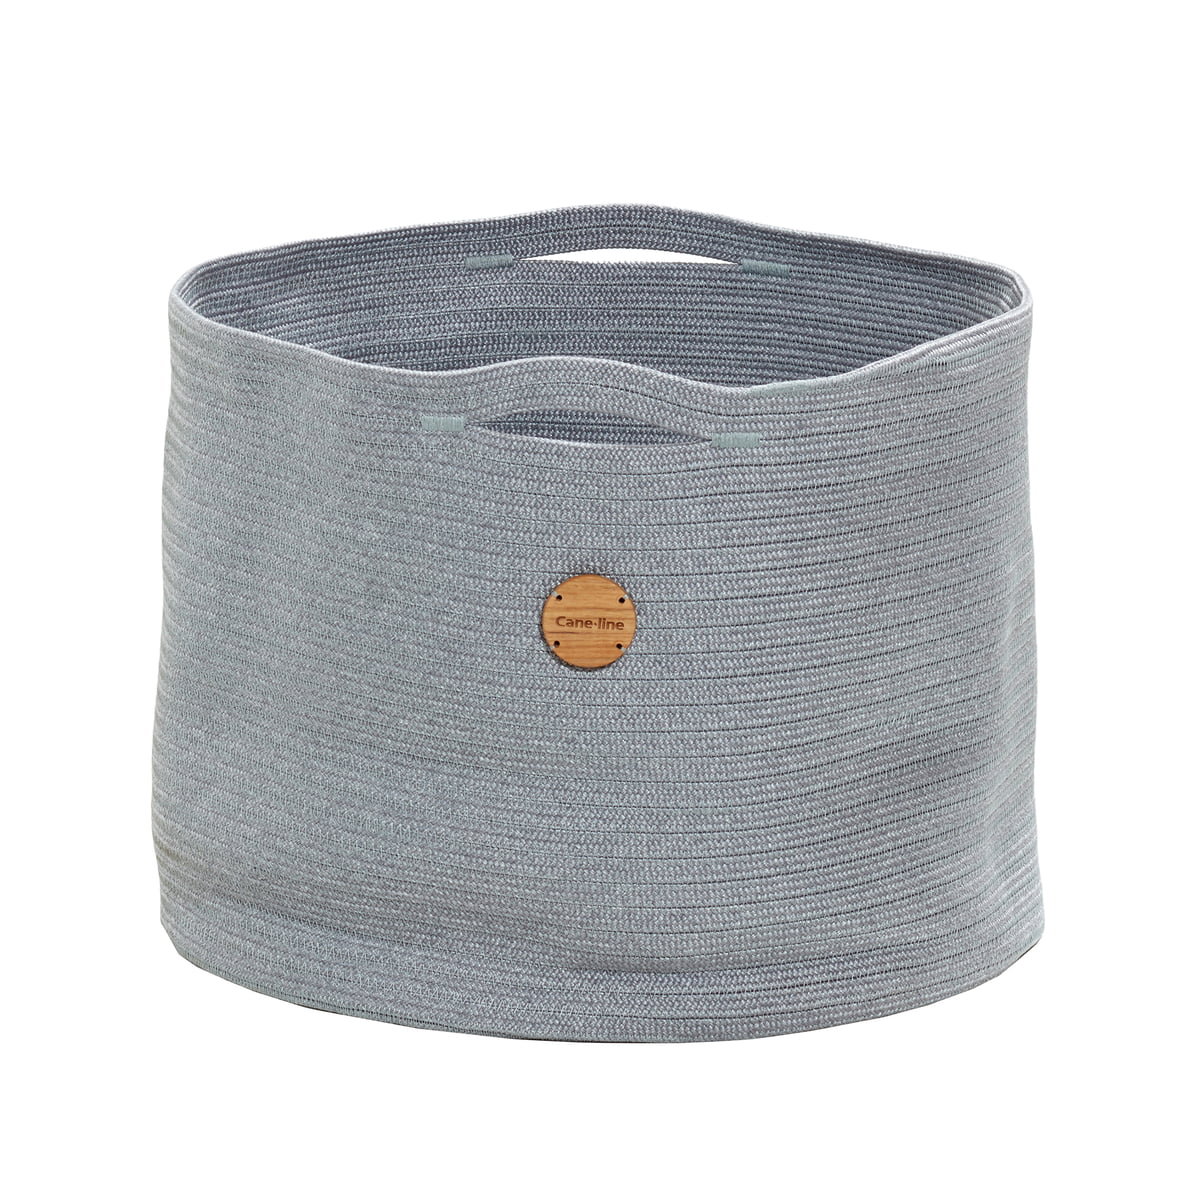 Cane-line - Soft Aufbewahrungskorb Ø 50 cm, hellgrau